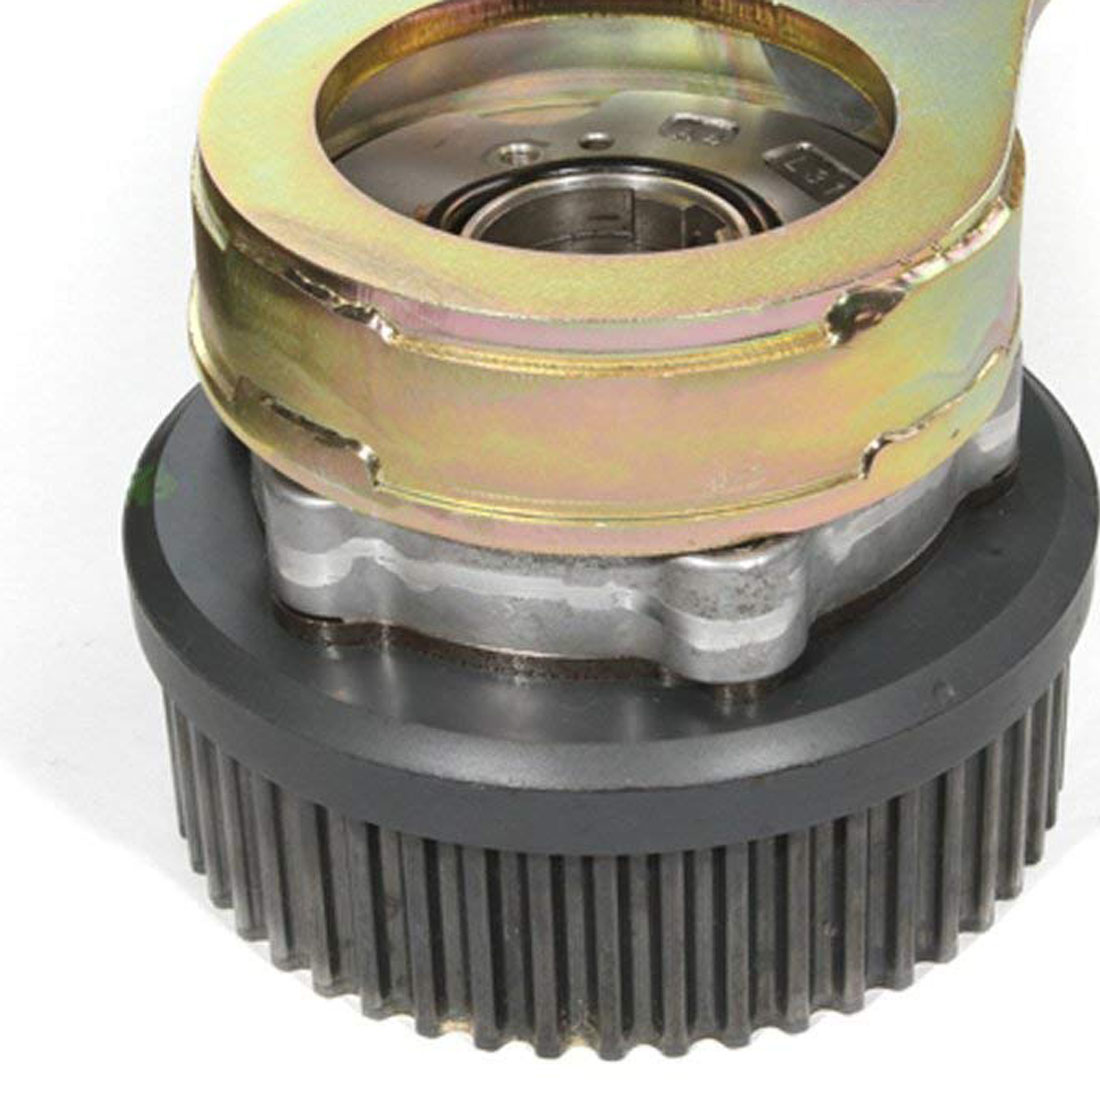 AVCS Intake Cam Sprocket Tool #499977500 Camshaft Pulley Holder For Subaru #ya